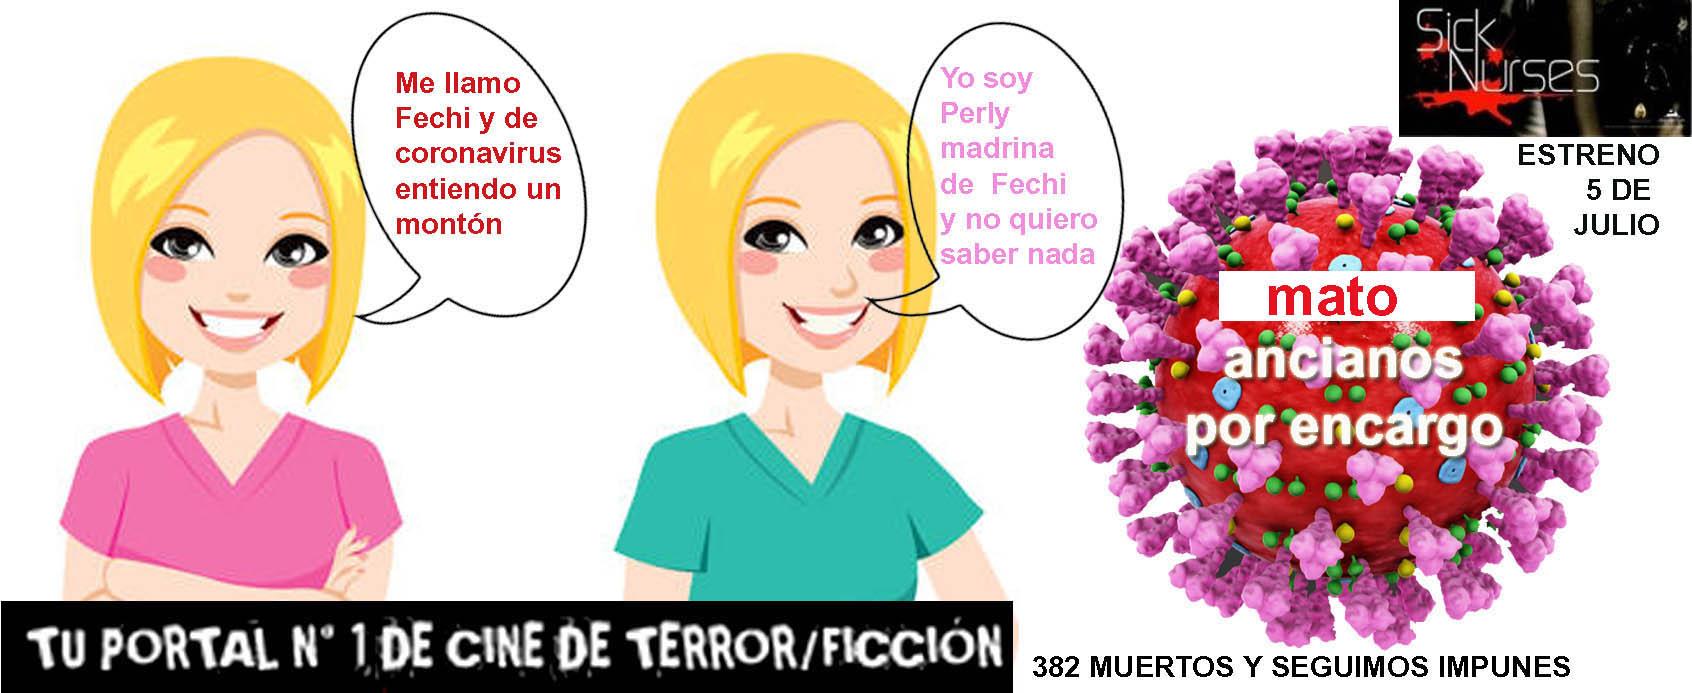 Karina Falagan ( Caridad ) Corina Porro ( Perly ) madrina de ...